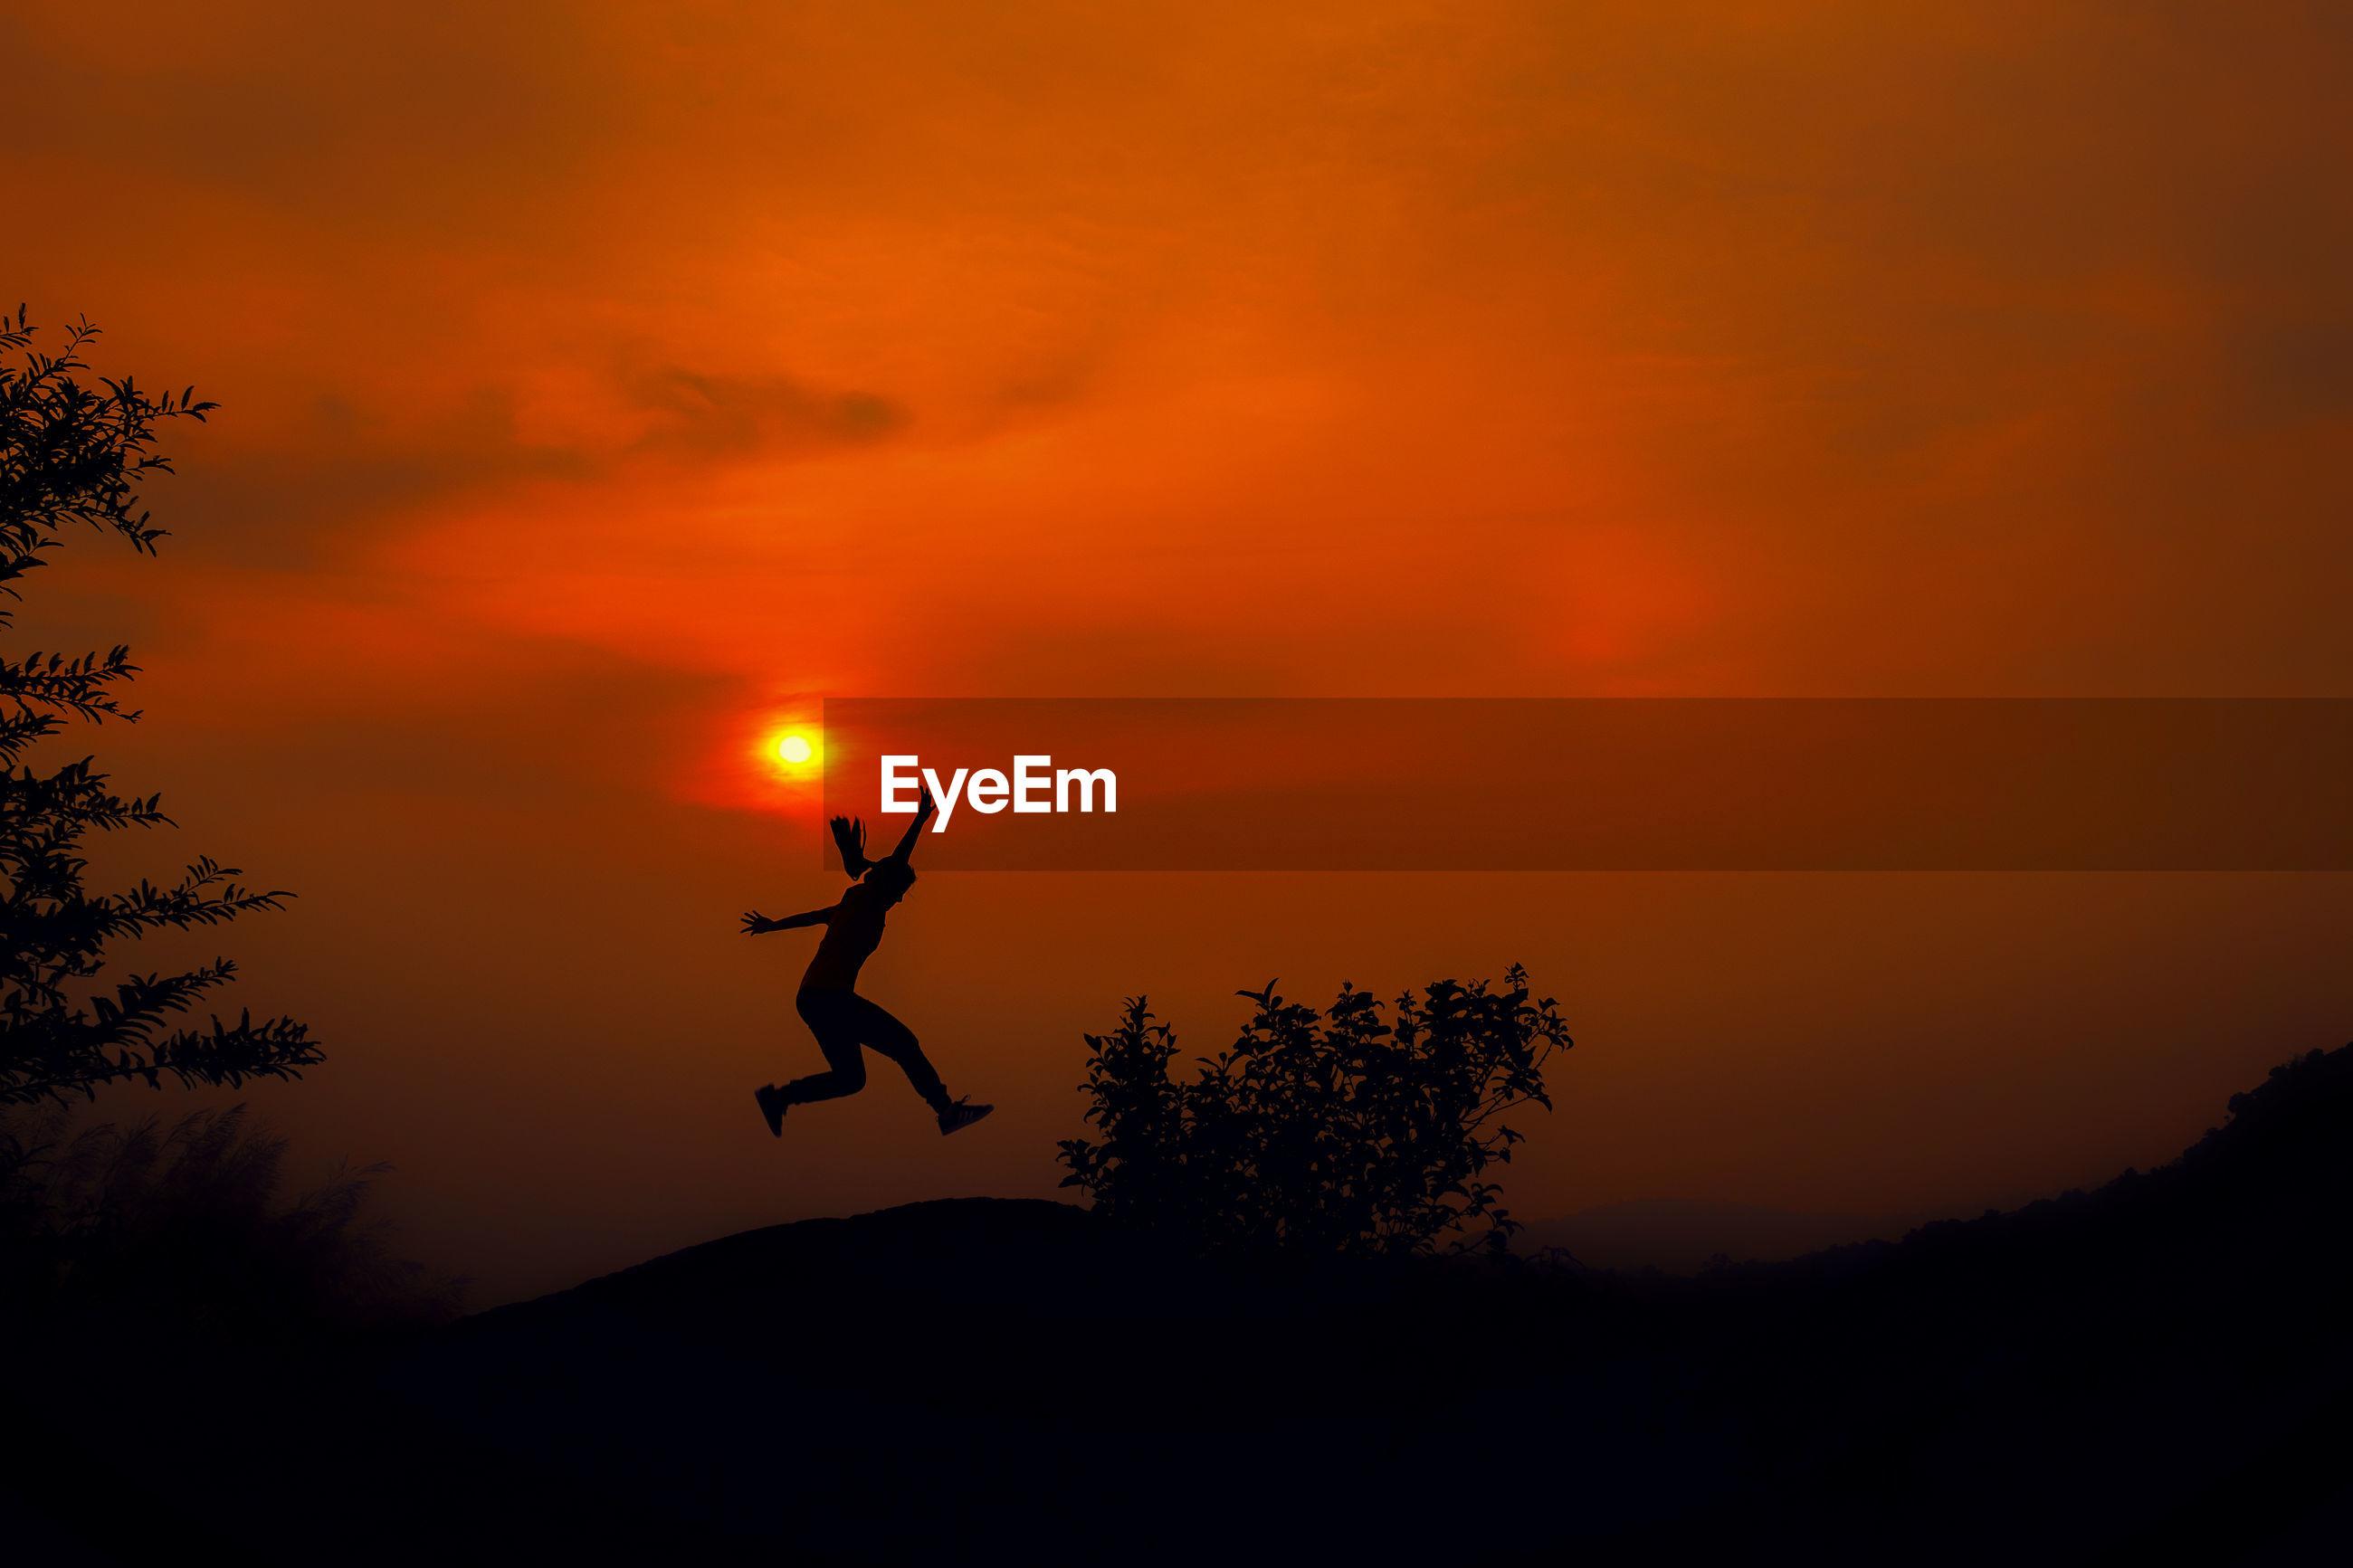 Silhouette man jumping on field against orange sky